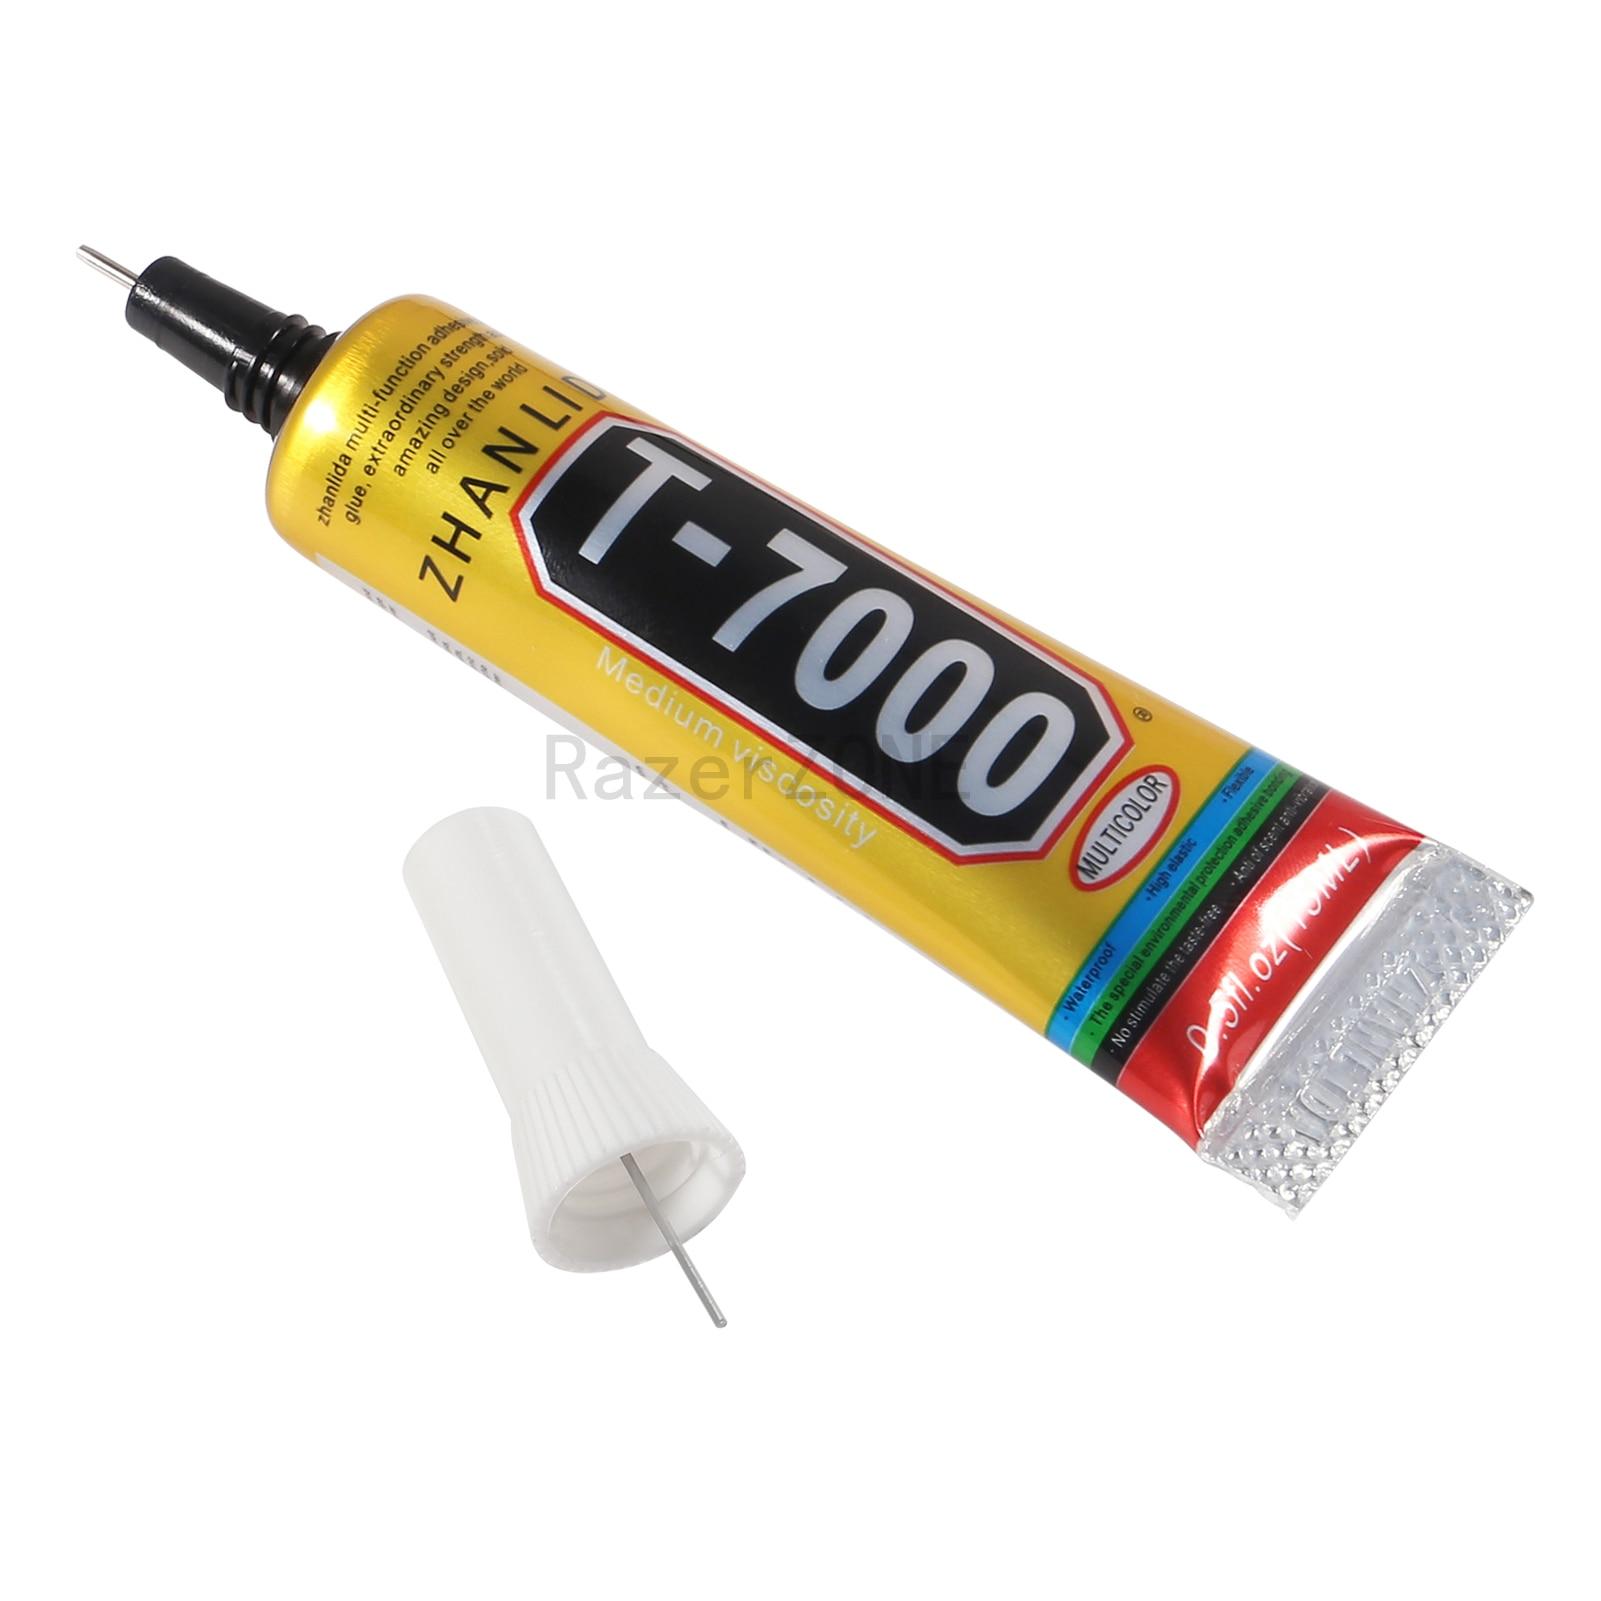 pegamento-adhesivo-para-pantalla-lcd-pegamento-del-marco-t7000-para-reparacion-de-marcos-de-vidrio-15-50-110ml